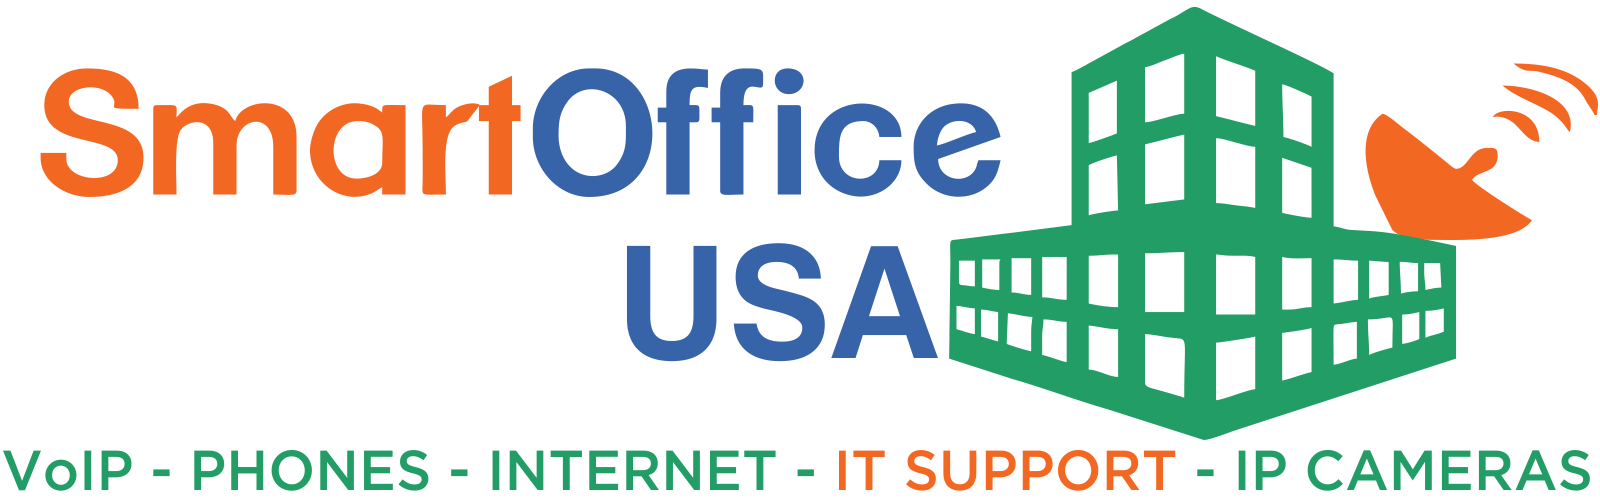 SmartOfficeUSA logo